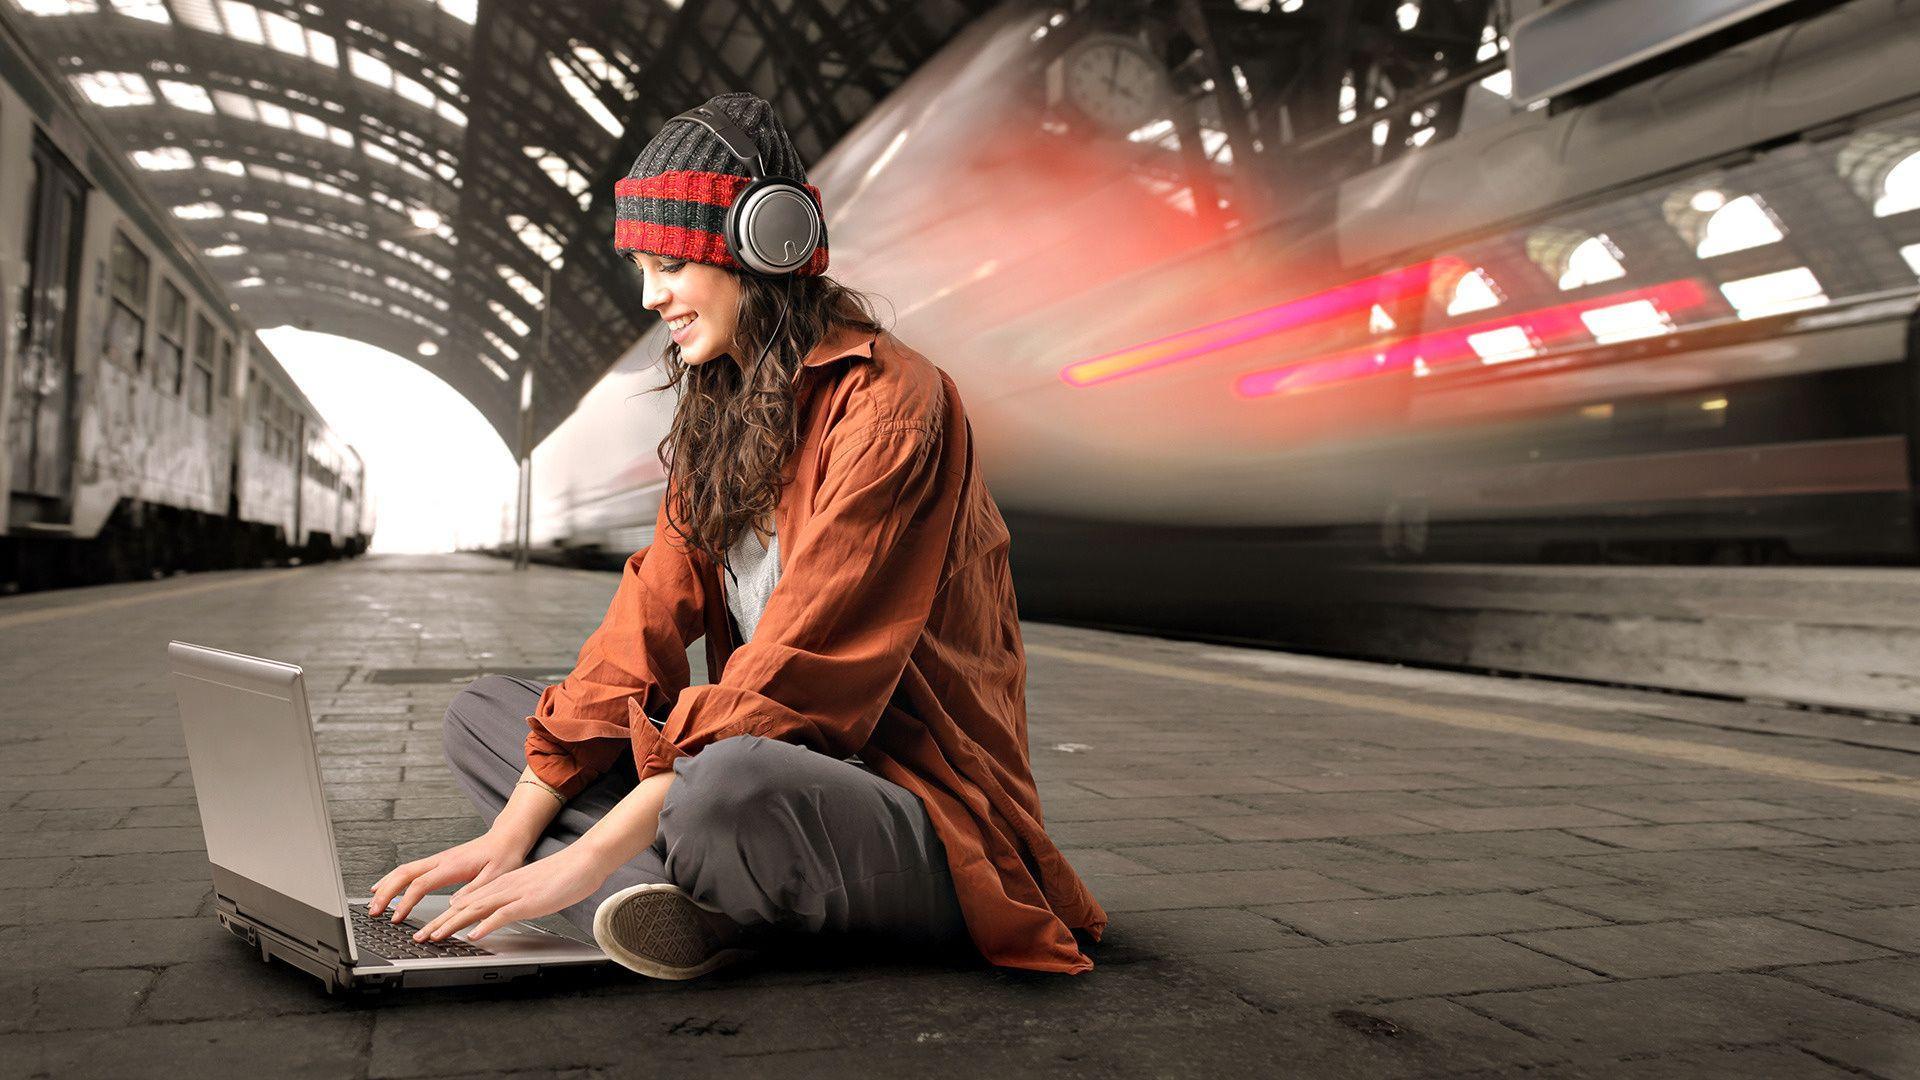 Girl Laptop Wallpapers Top Free Girl Laptop Backgrounds Wallpaperaccess